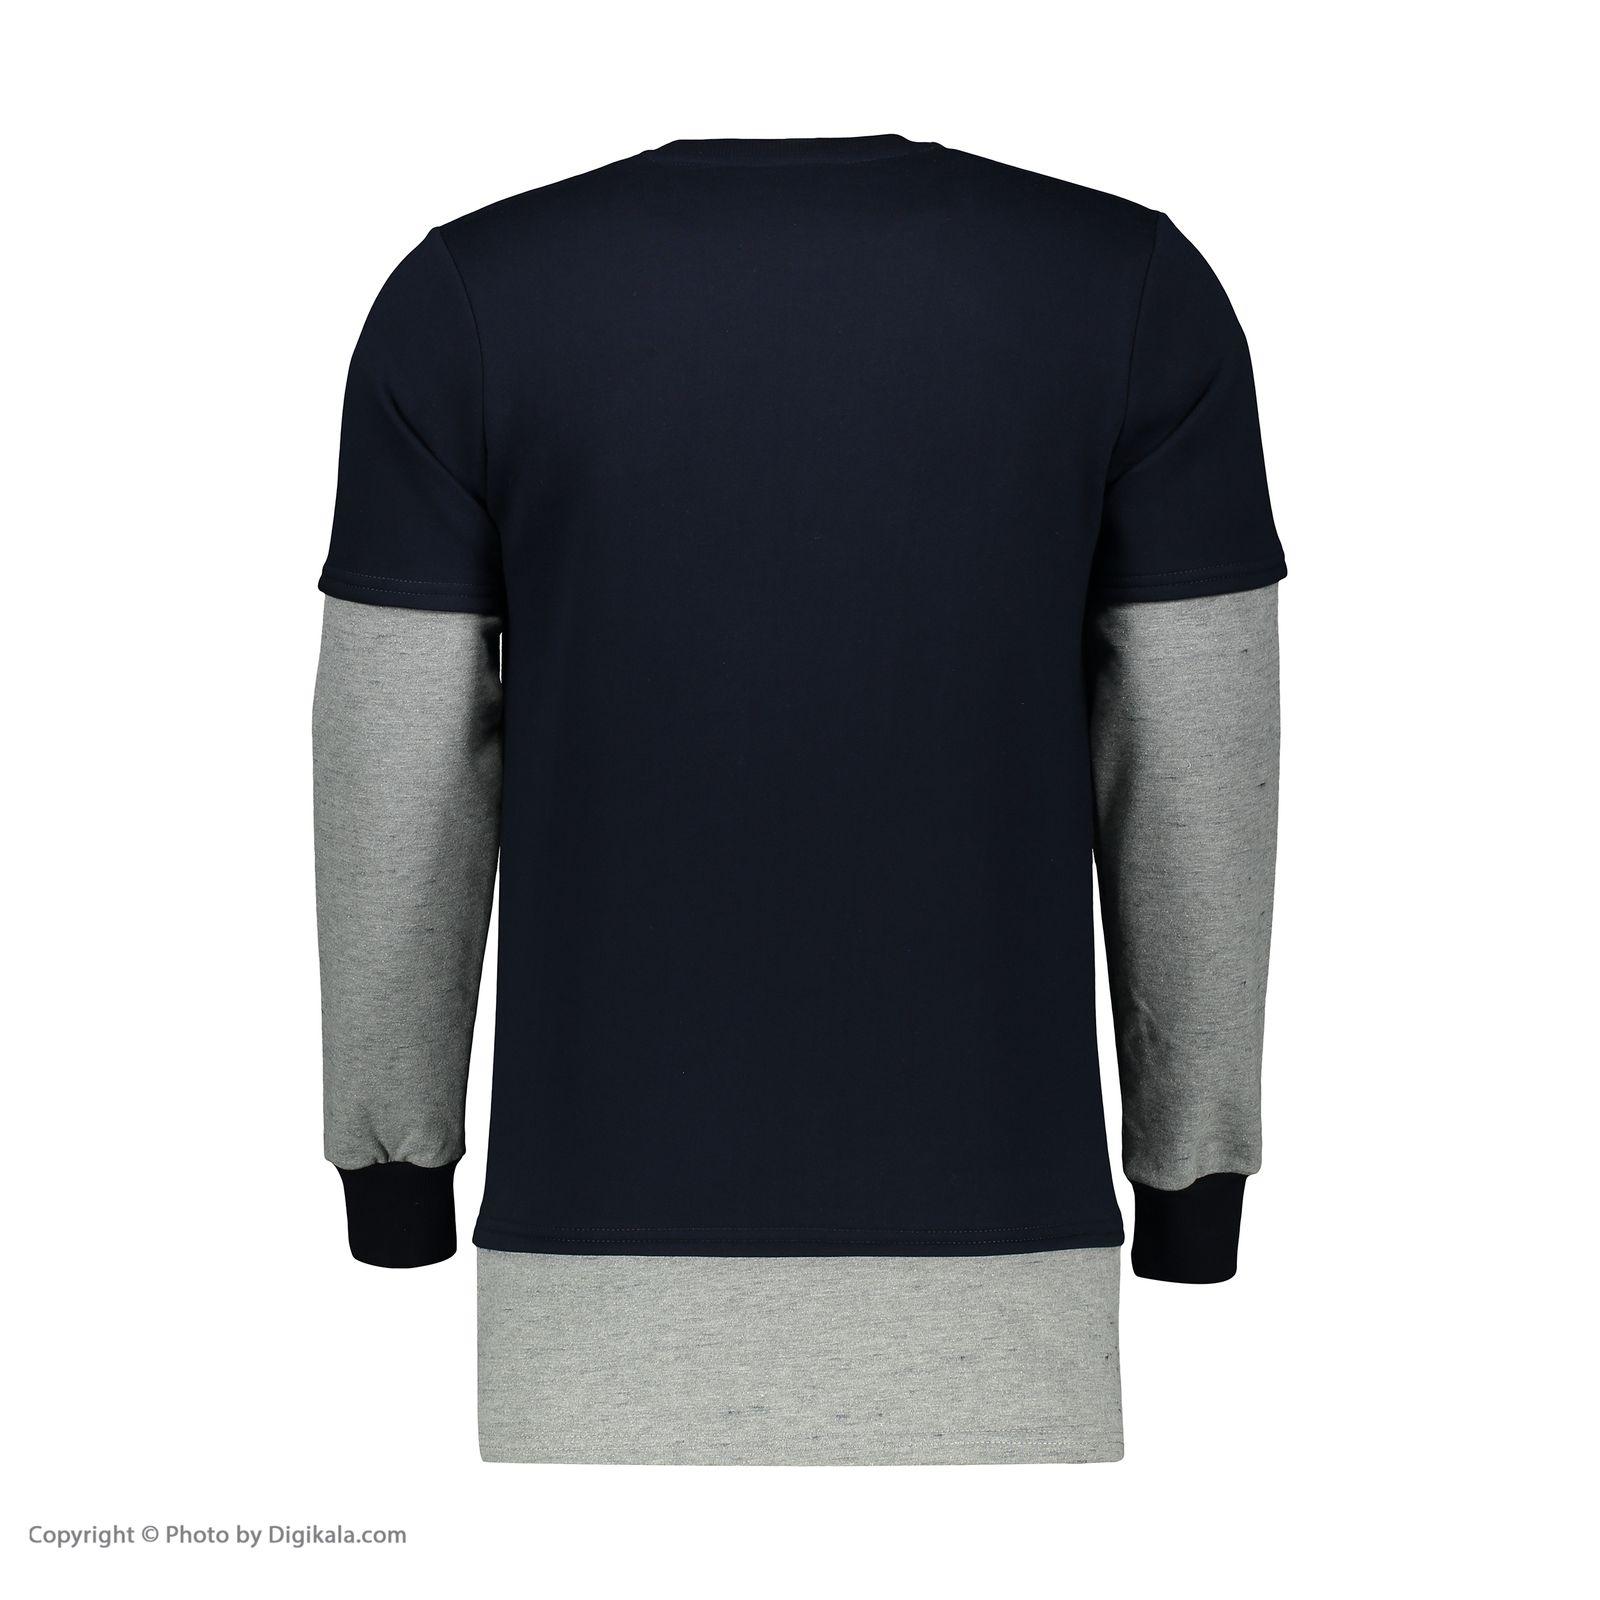 سوییشرت مردانه باینت کد 600-2 -  - 5